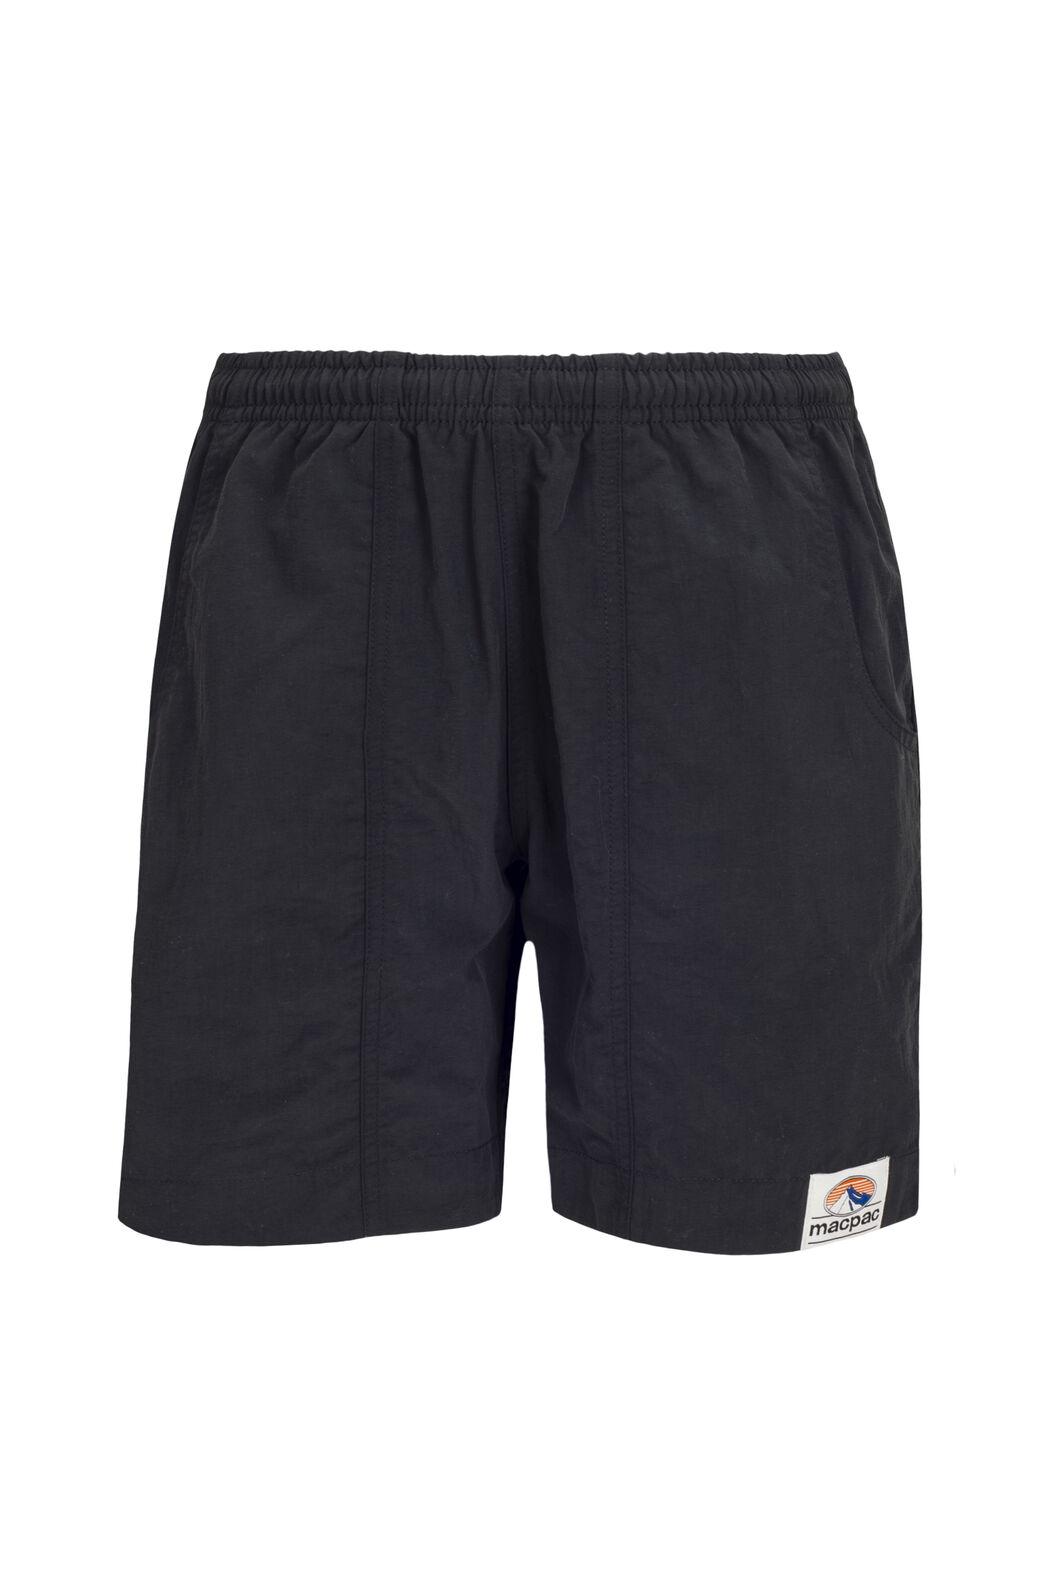 Macpac Kids' Winger Shorts, Black, hi-res